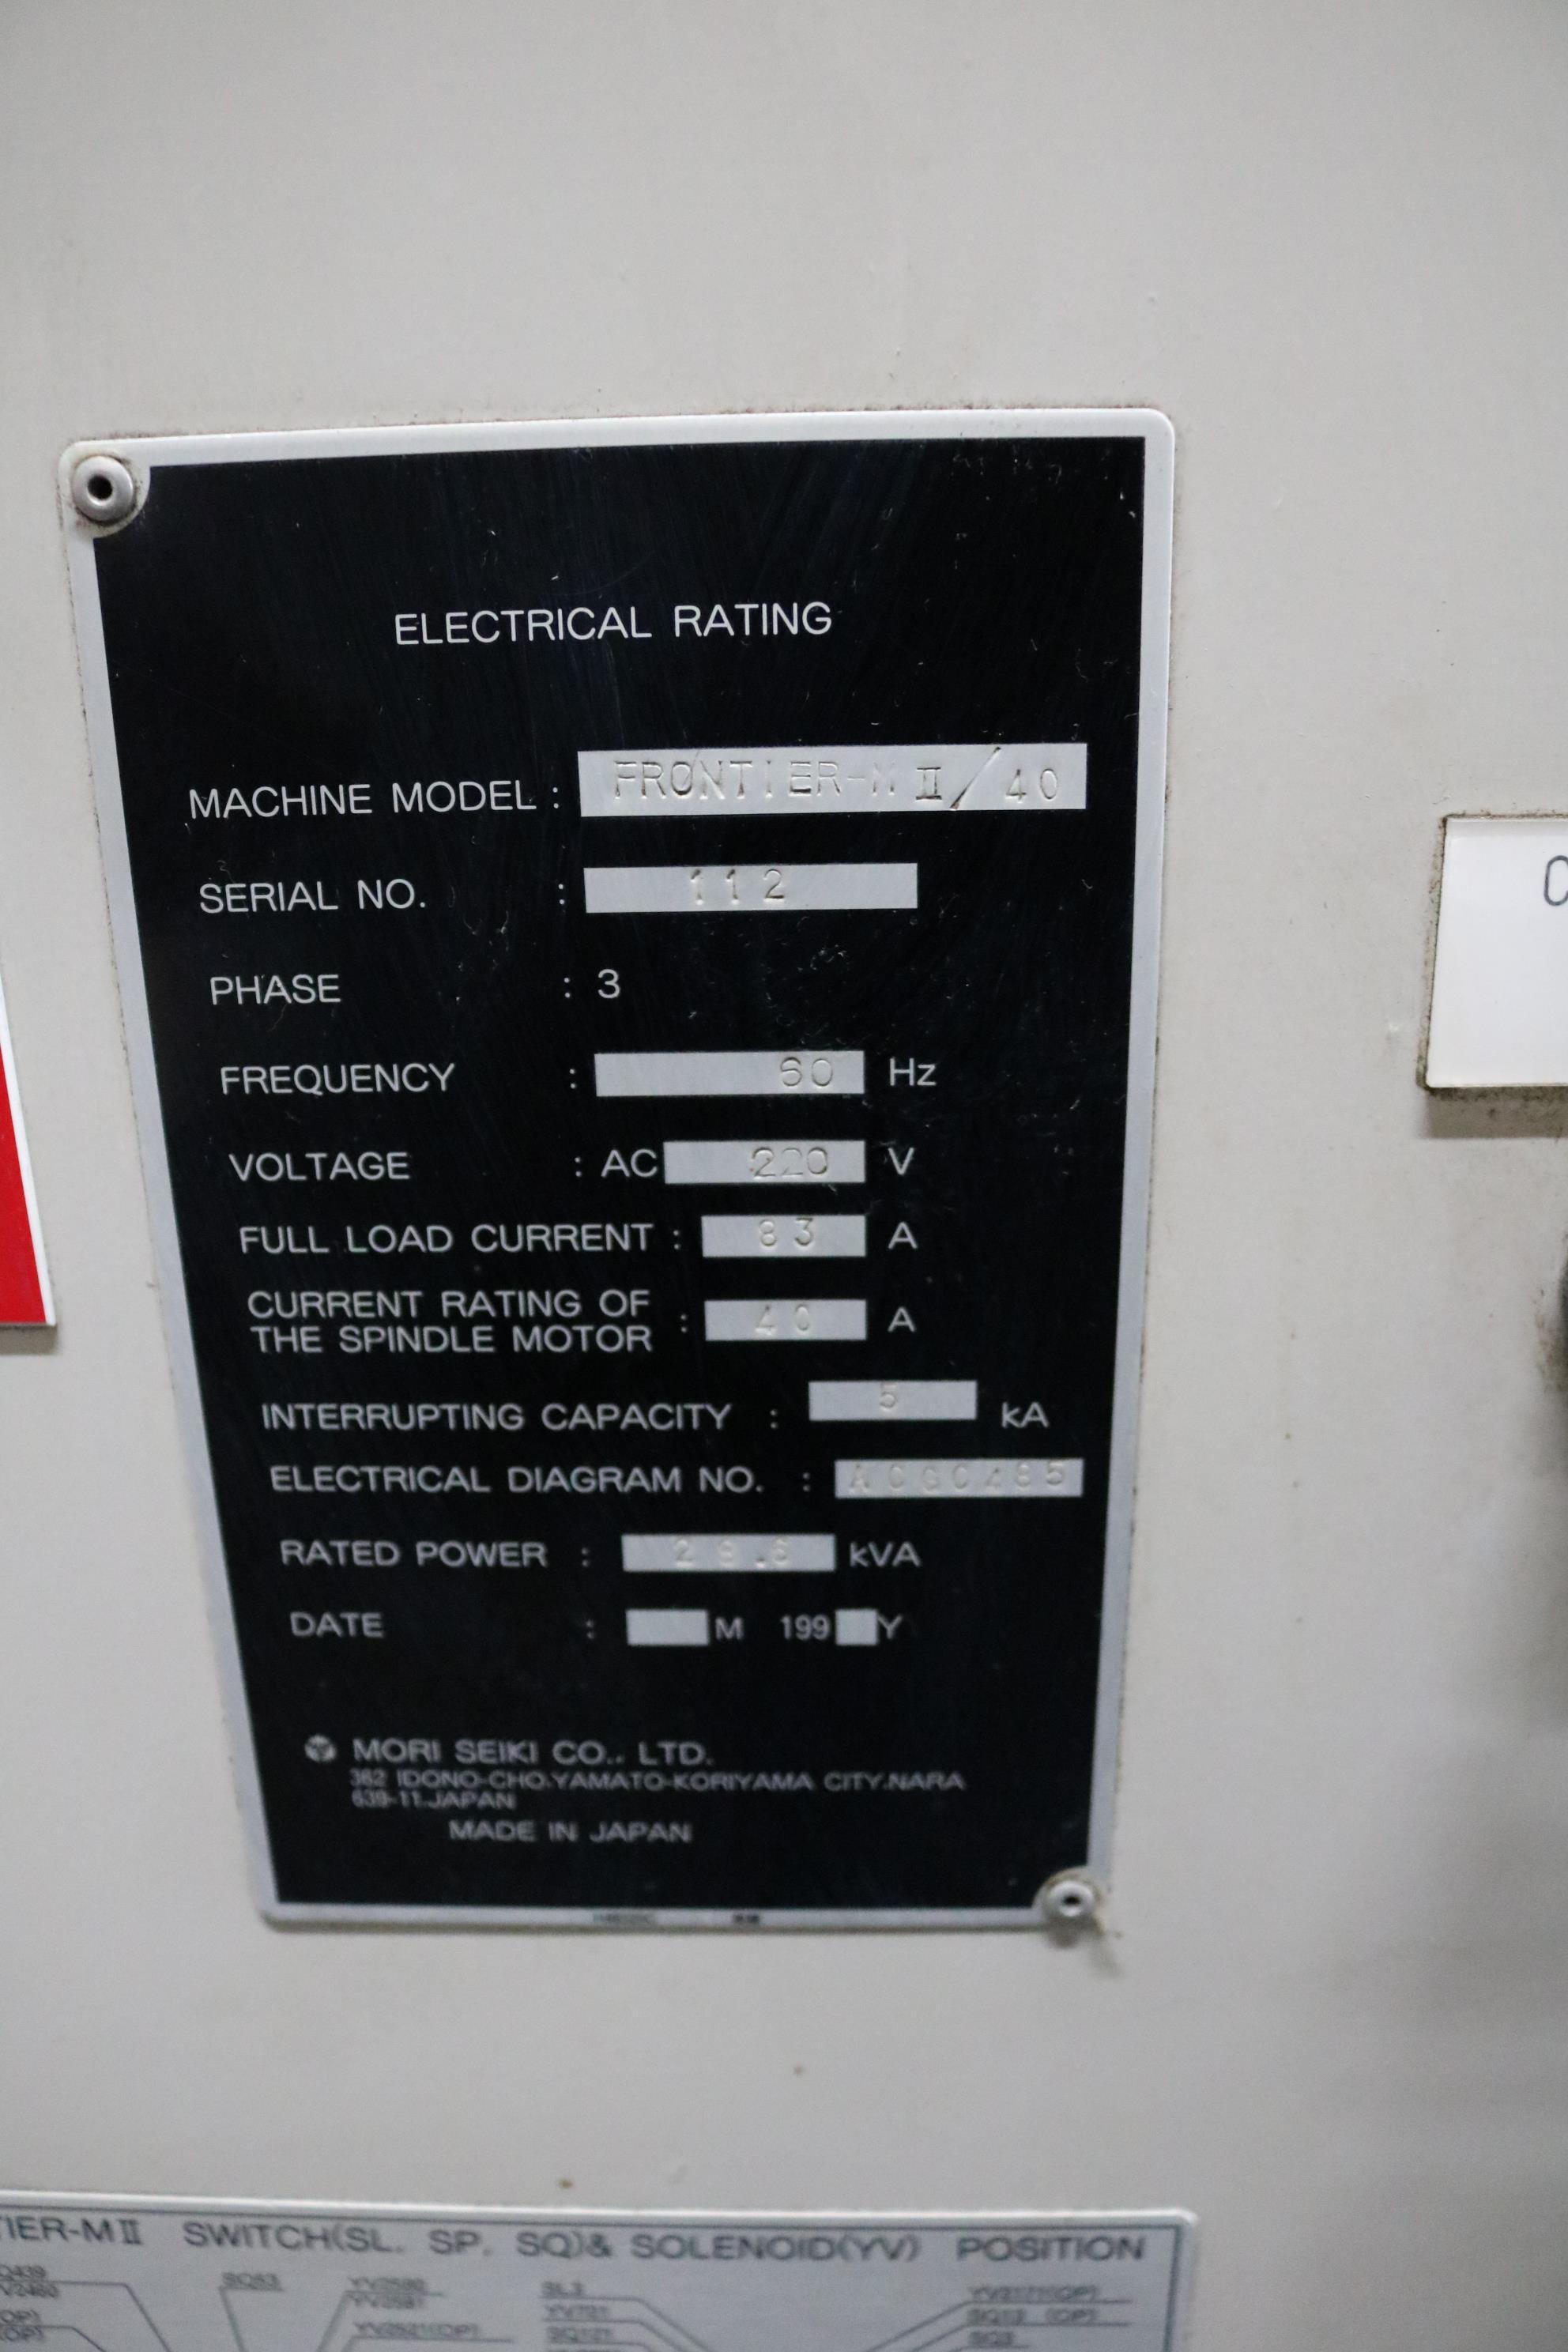 Lot 4 - 2000 MORI SEIKI CNC VERTICAL MACHINING CENTER, MODEL FRONTIER-MII/40, (2) PALLET SHUTTLE SYSTEM,